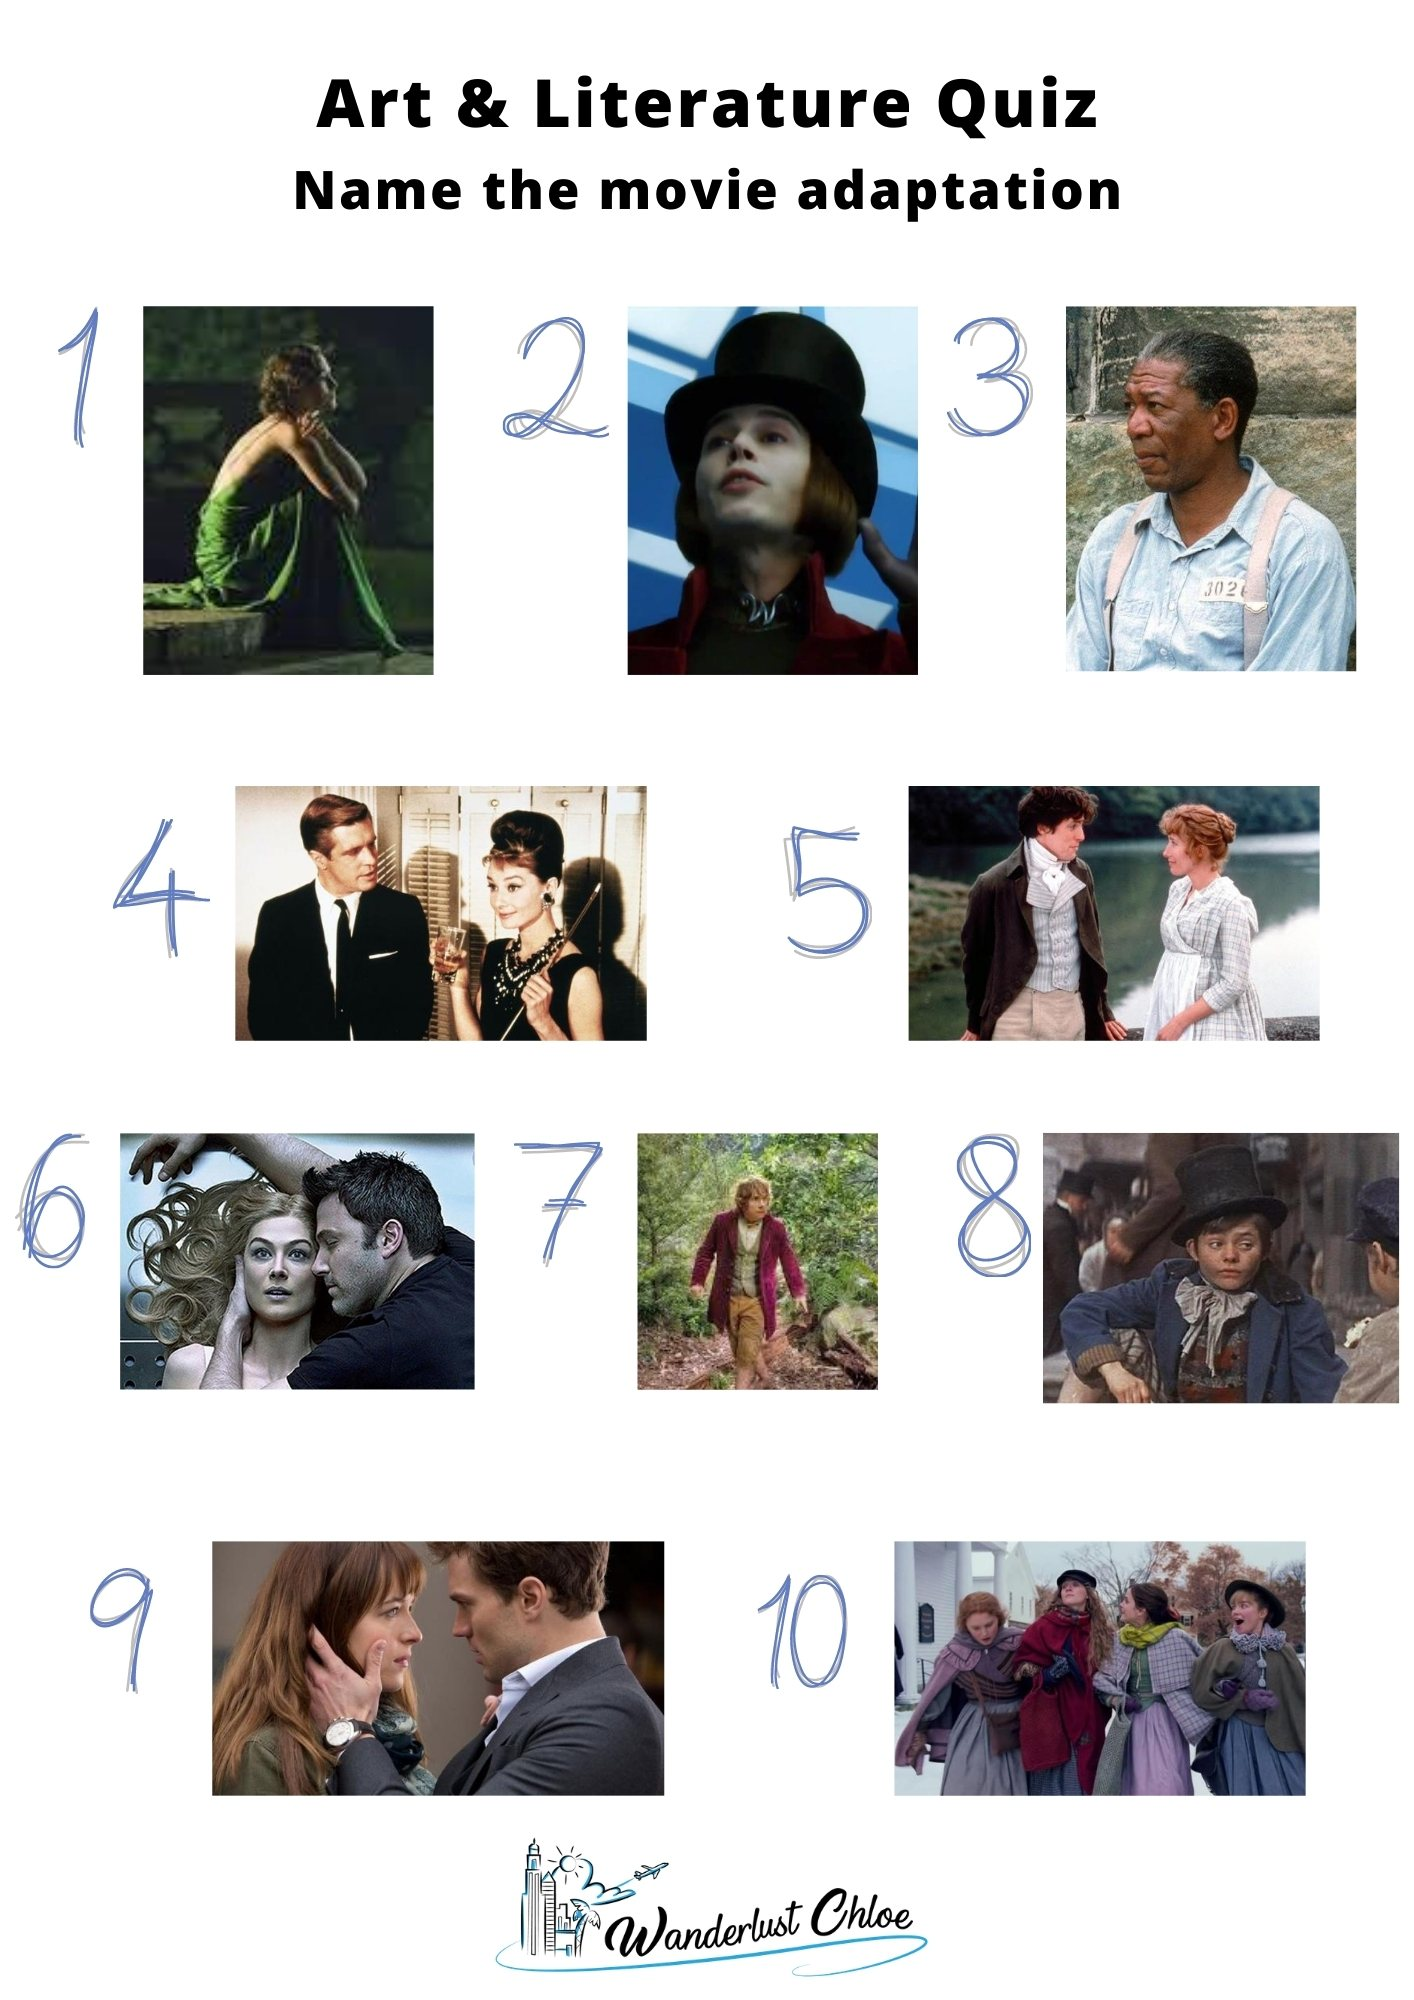 Round 3 - Art and Literature Quiz Questions: Picture Round